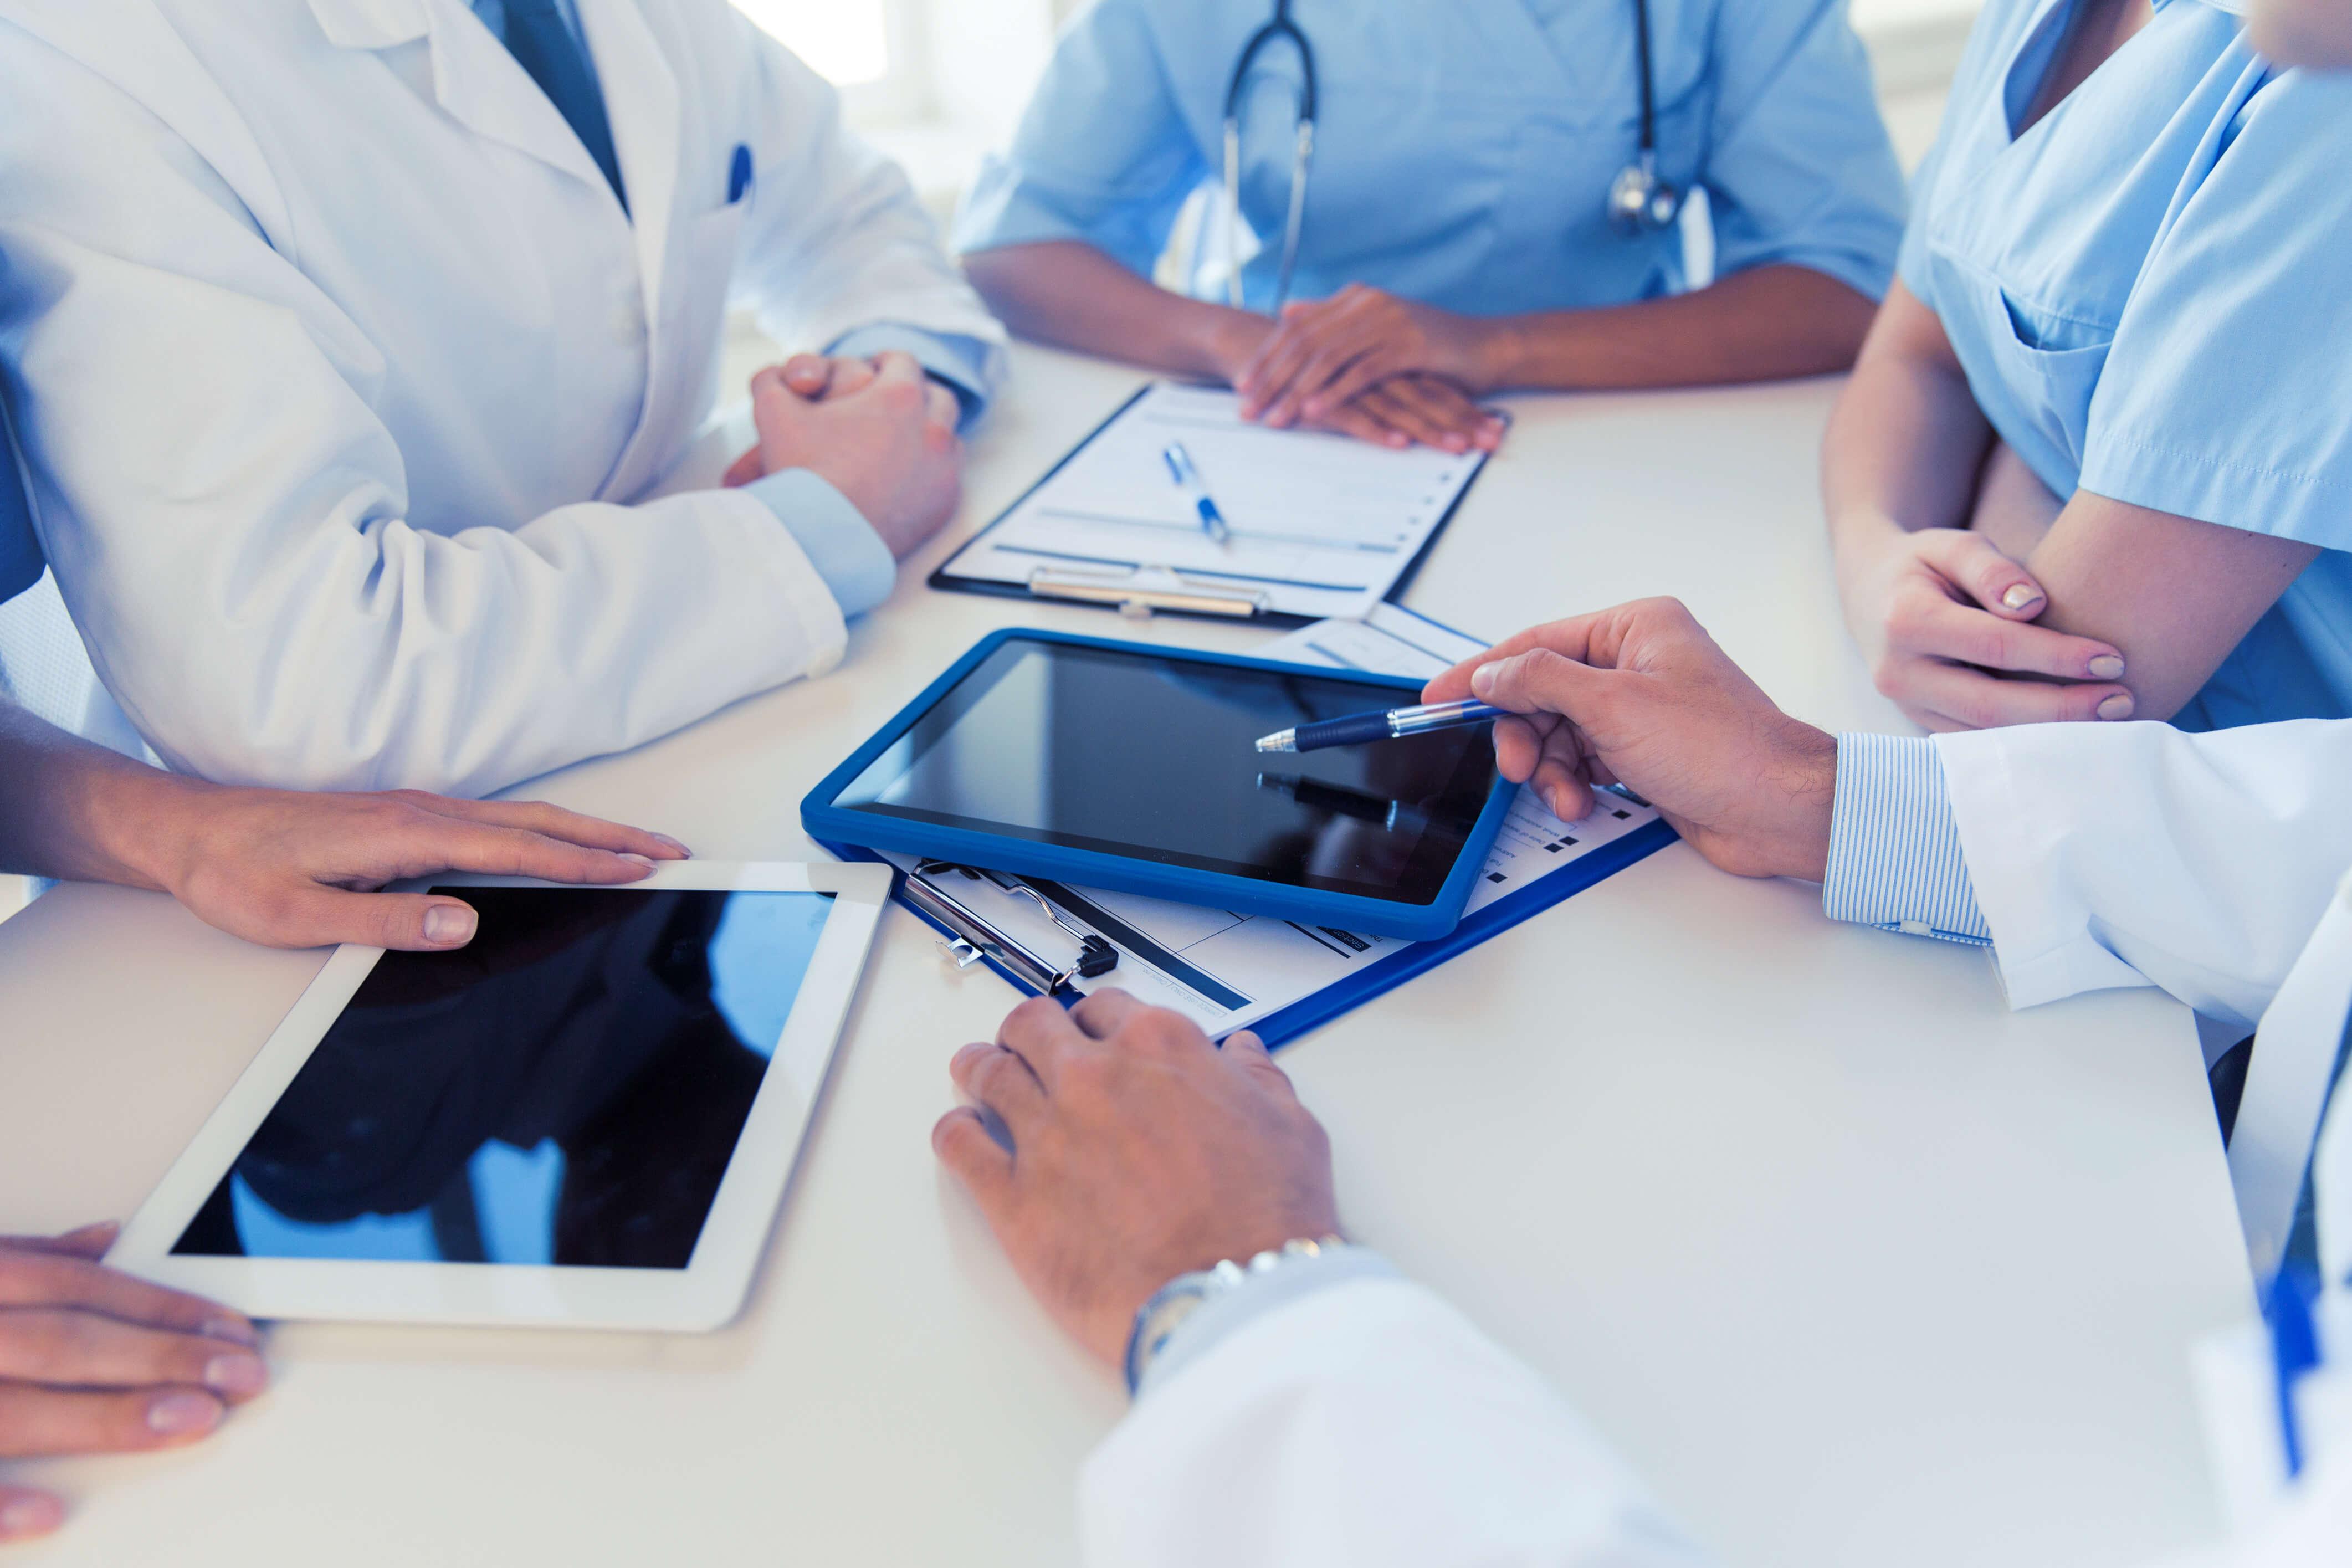 doctors tablet hands pen stethoscope medical nurse triage call